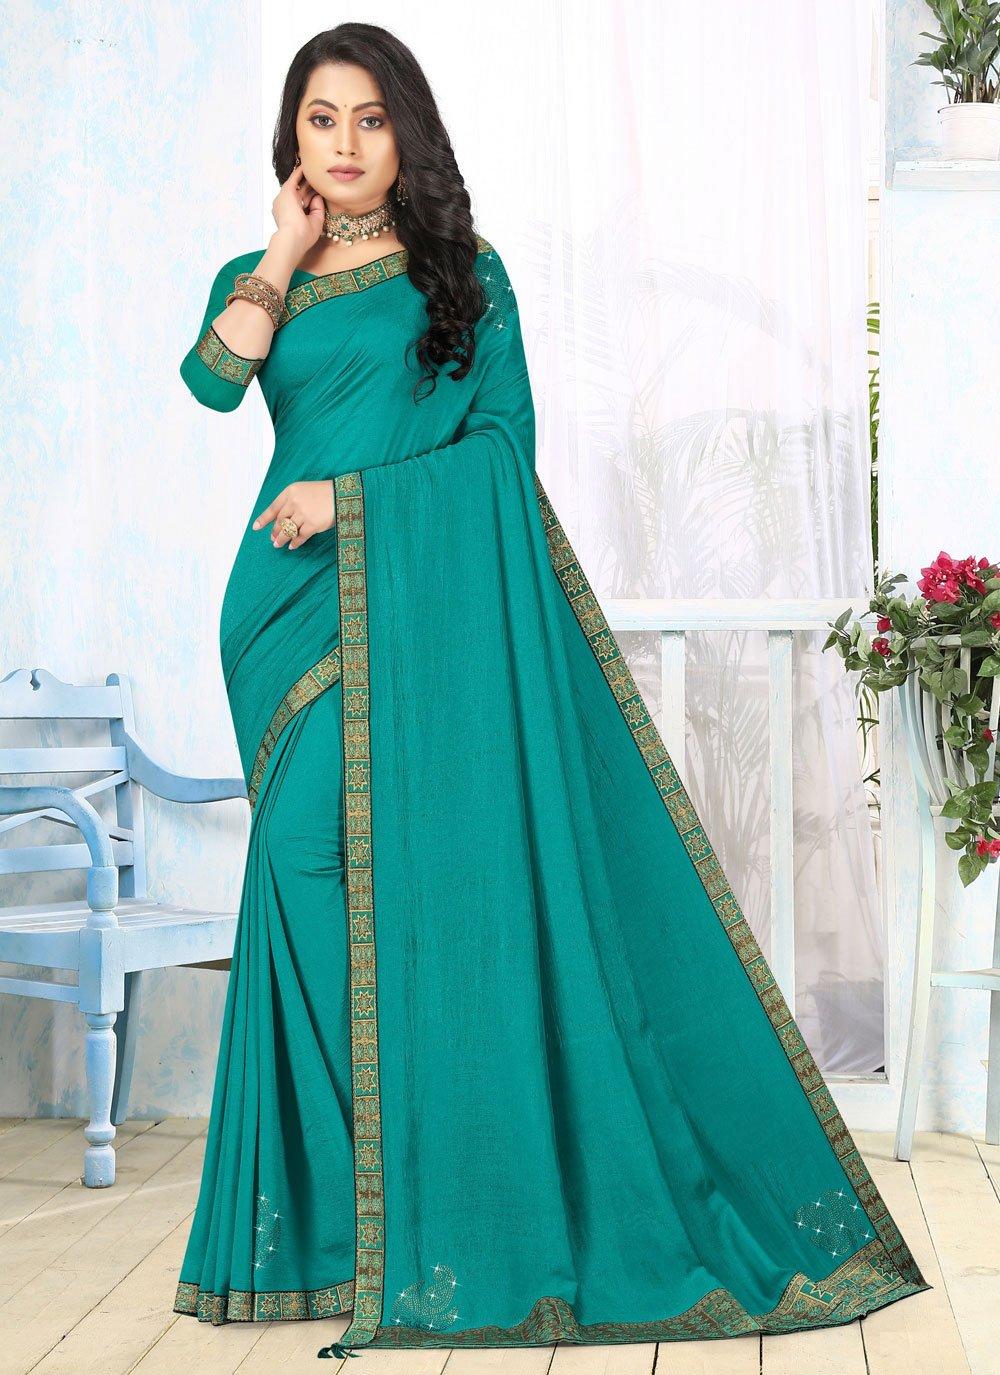 Classic Saree Lace Vichitra Silk in Turquoise